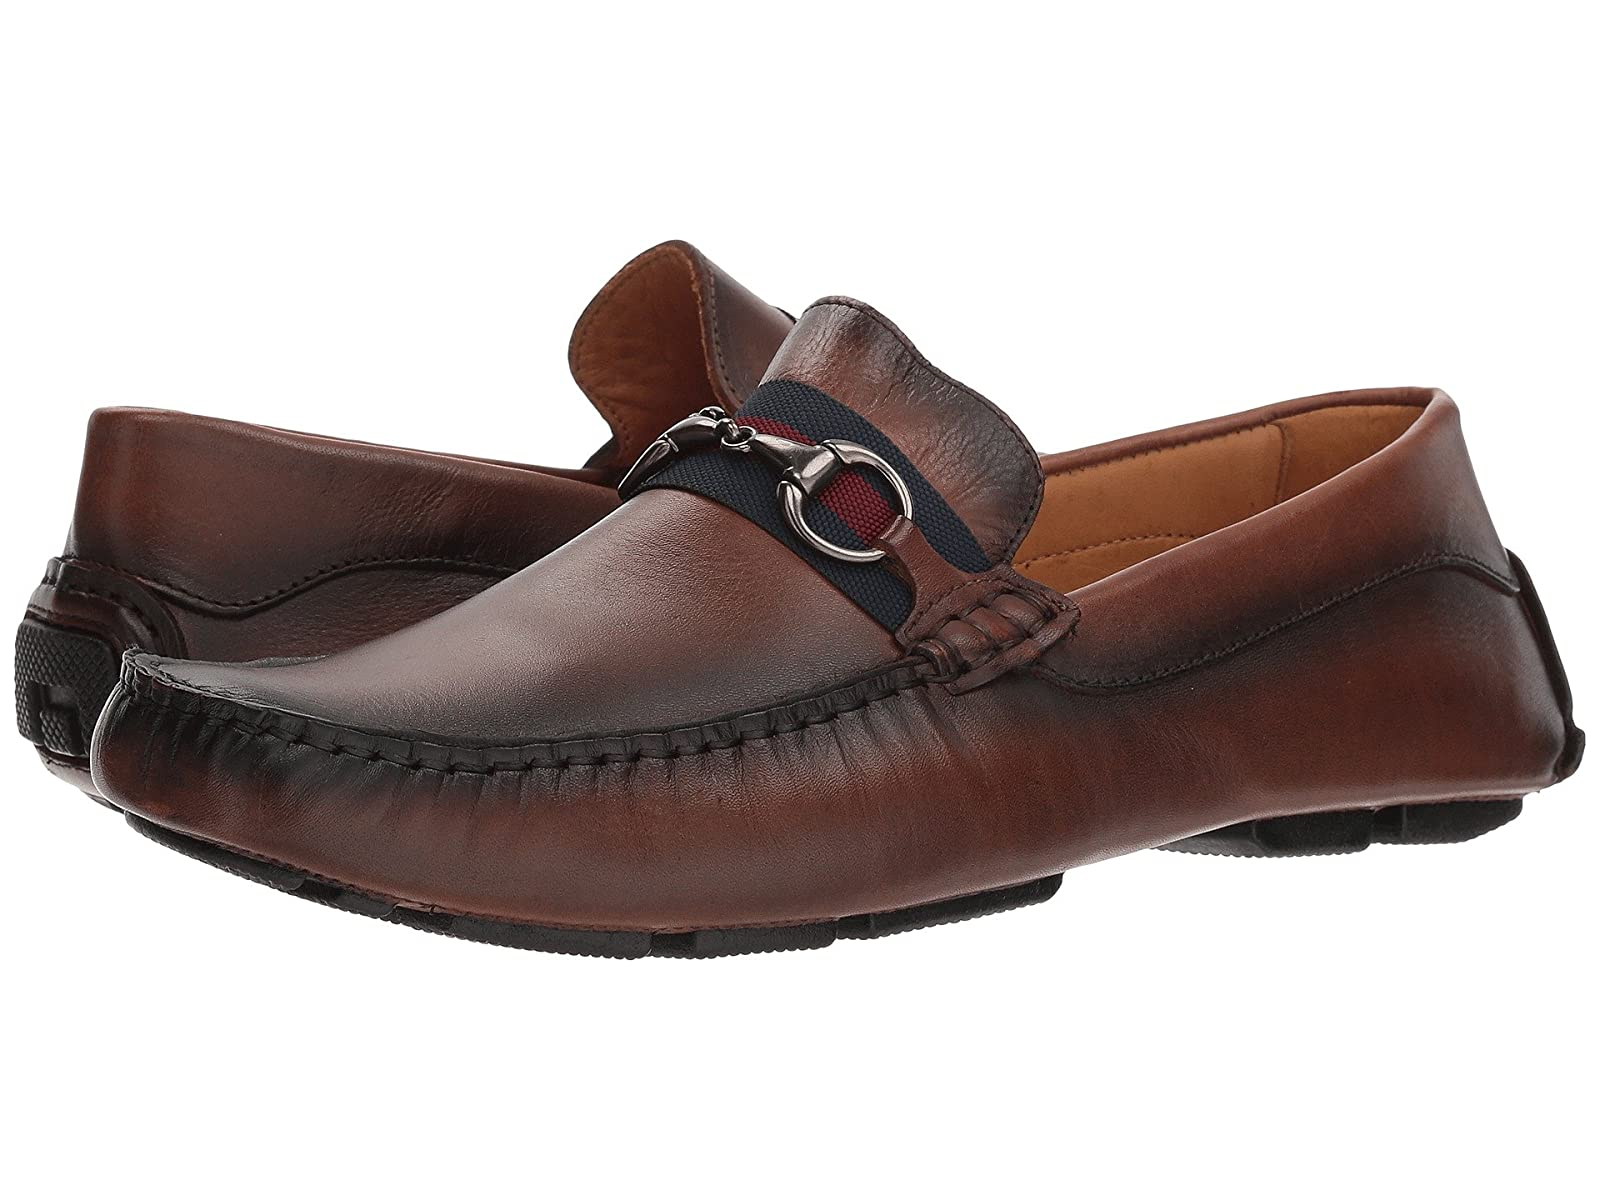 Massimo Matteo Bit-Strap DriverAtmospheric grades have affordable shoes